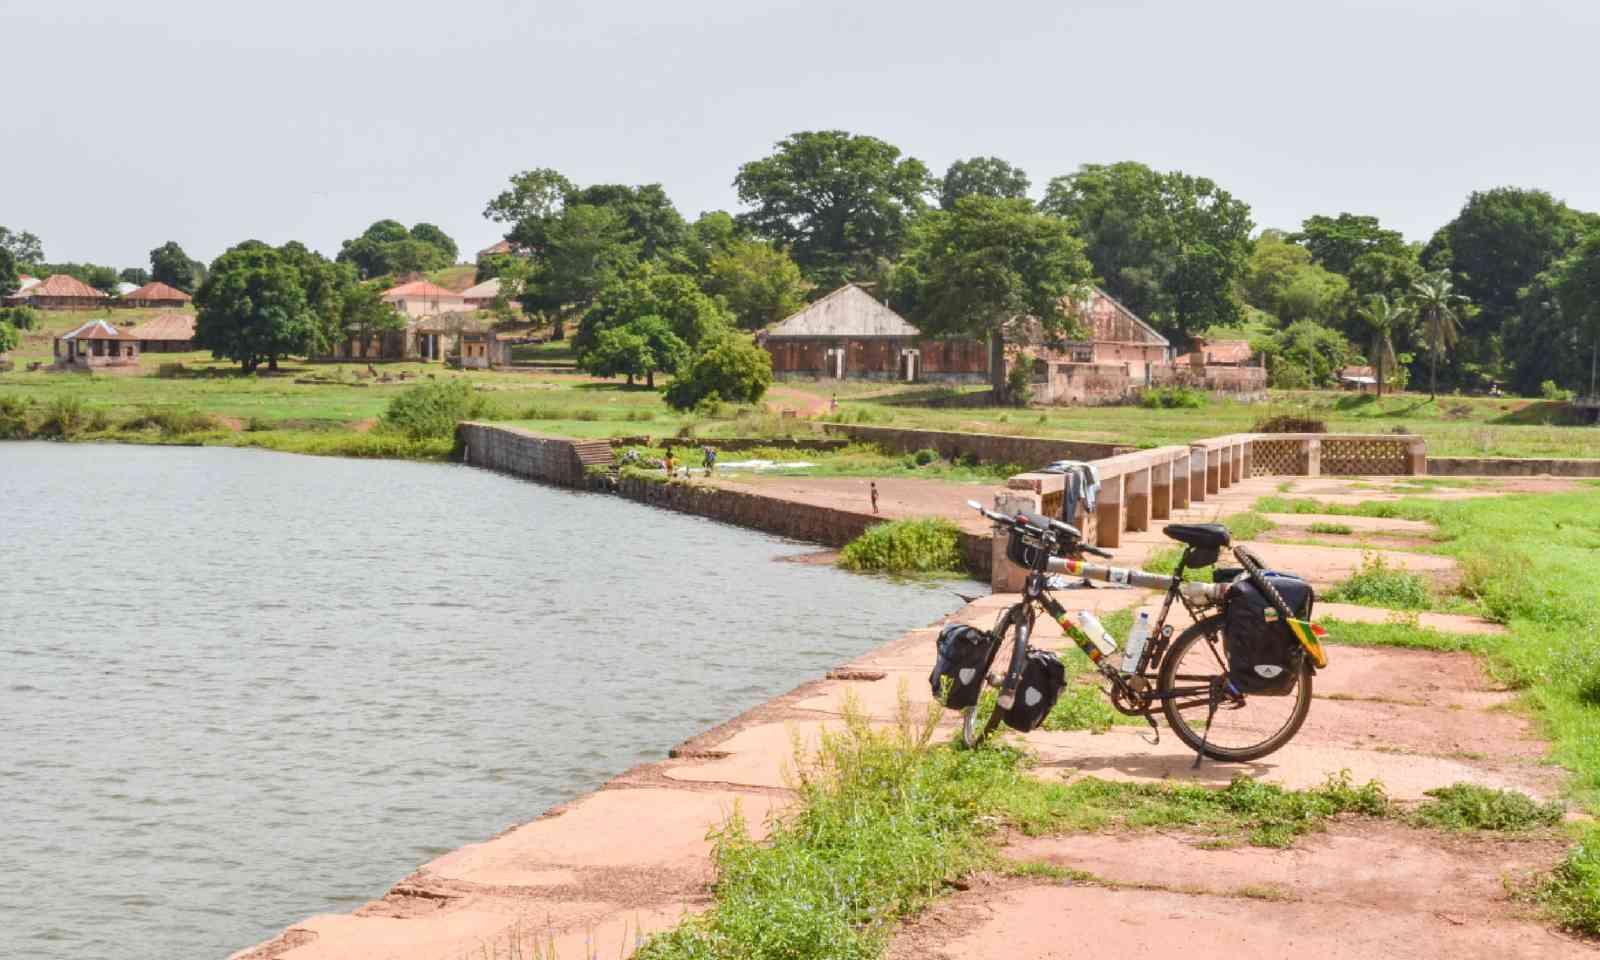 Bafata, Guinea-Bissau (Flickr Creative Commons: jbdodane)